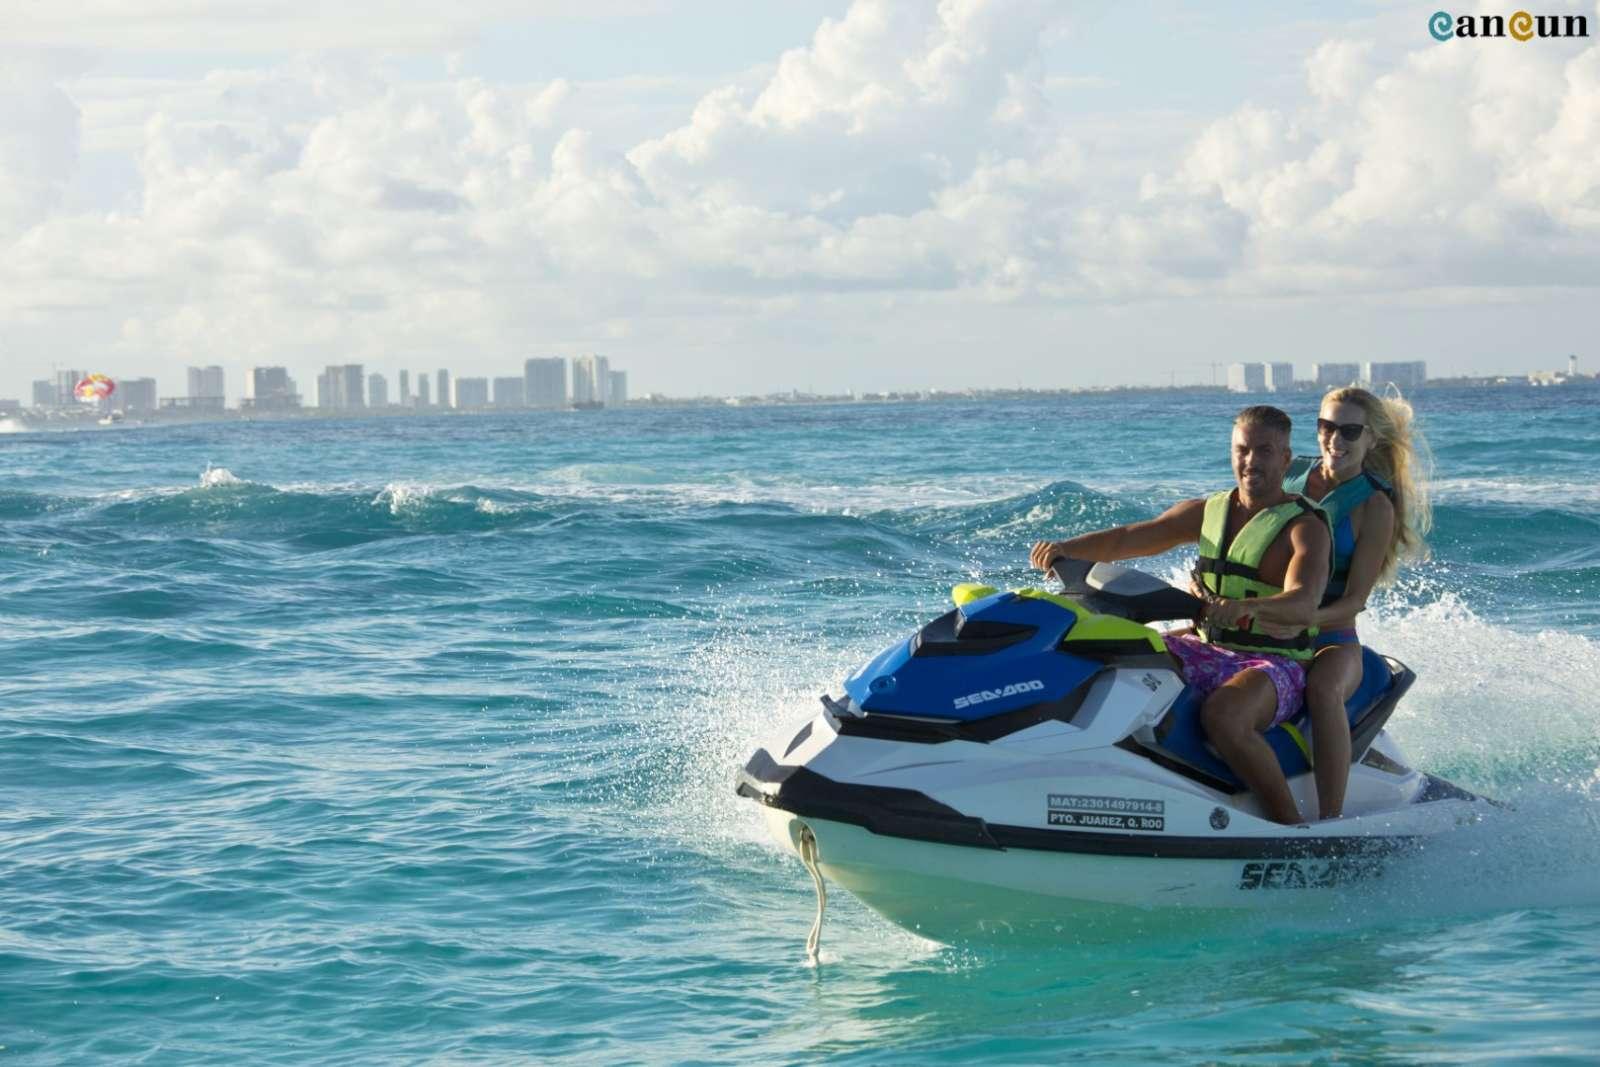 Cancun Mexico Jetski